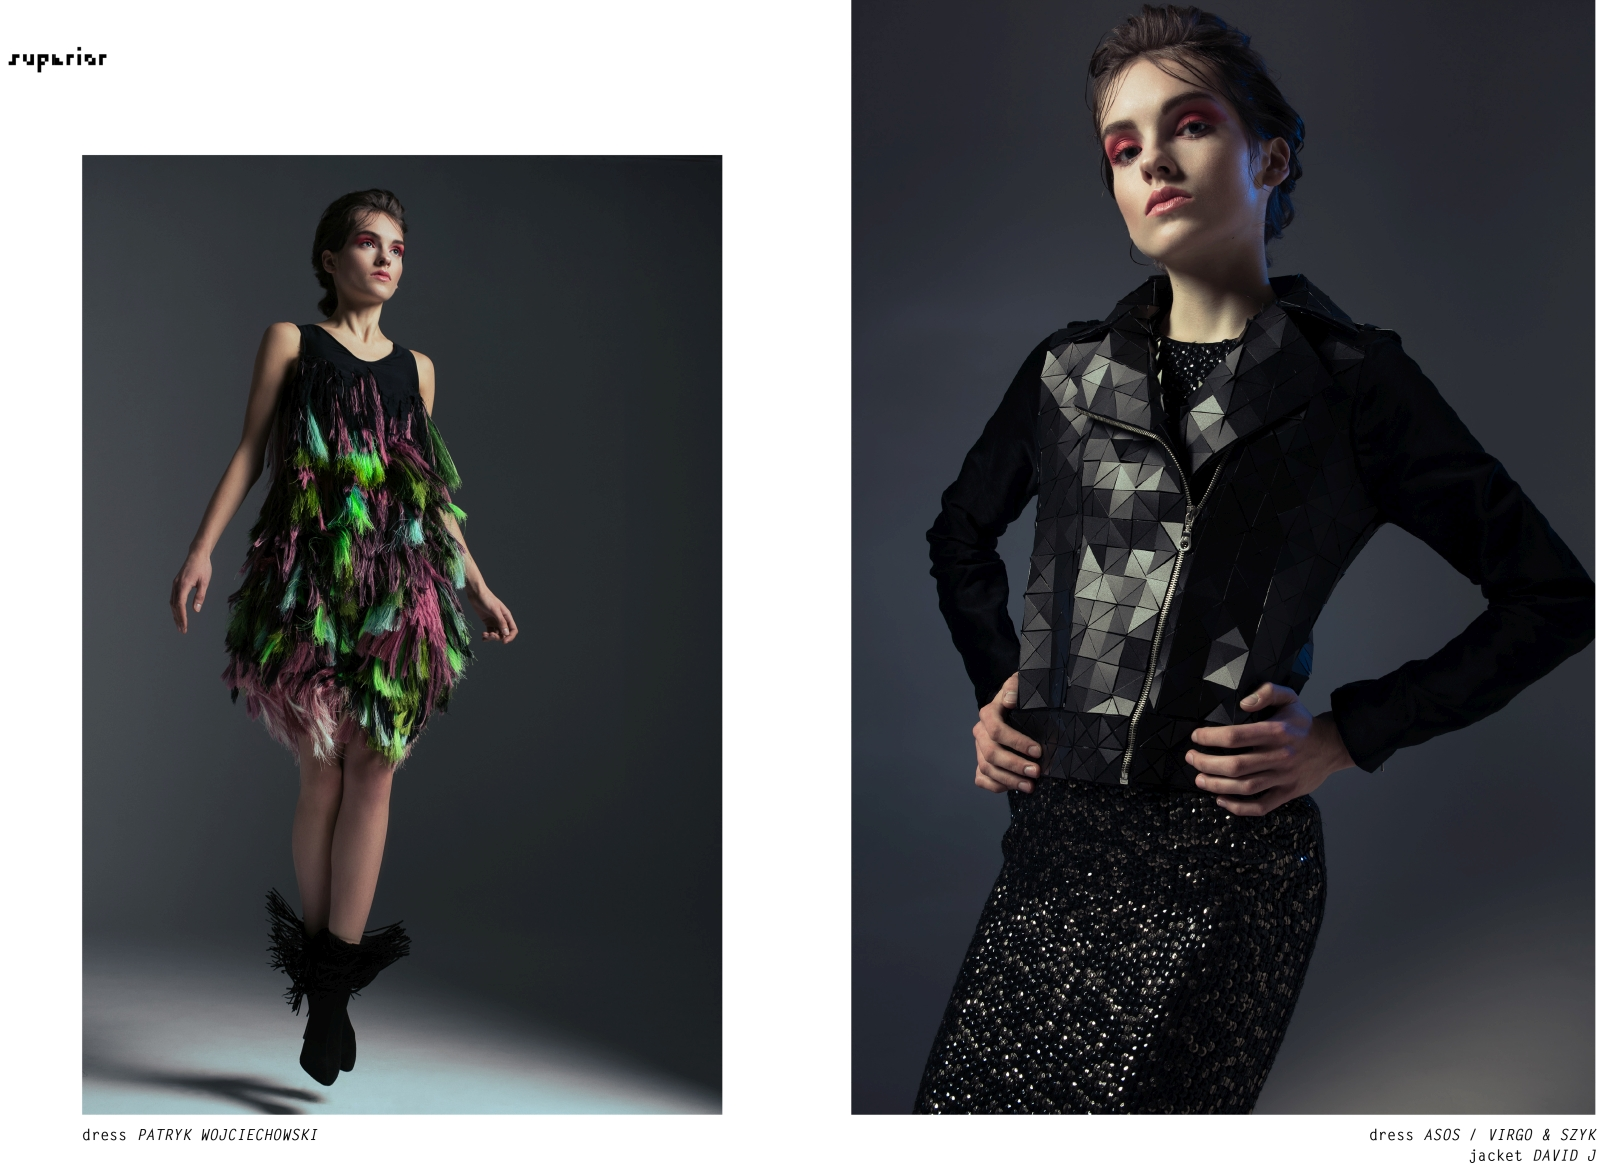 I-AM-THE-REBEL-Fashion-Editorial-by-ARTUR-MADEJ-3